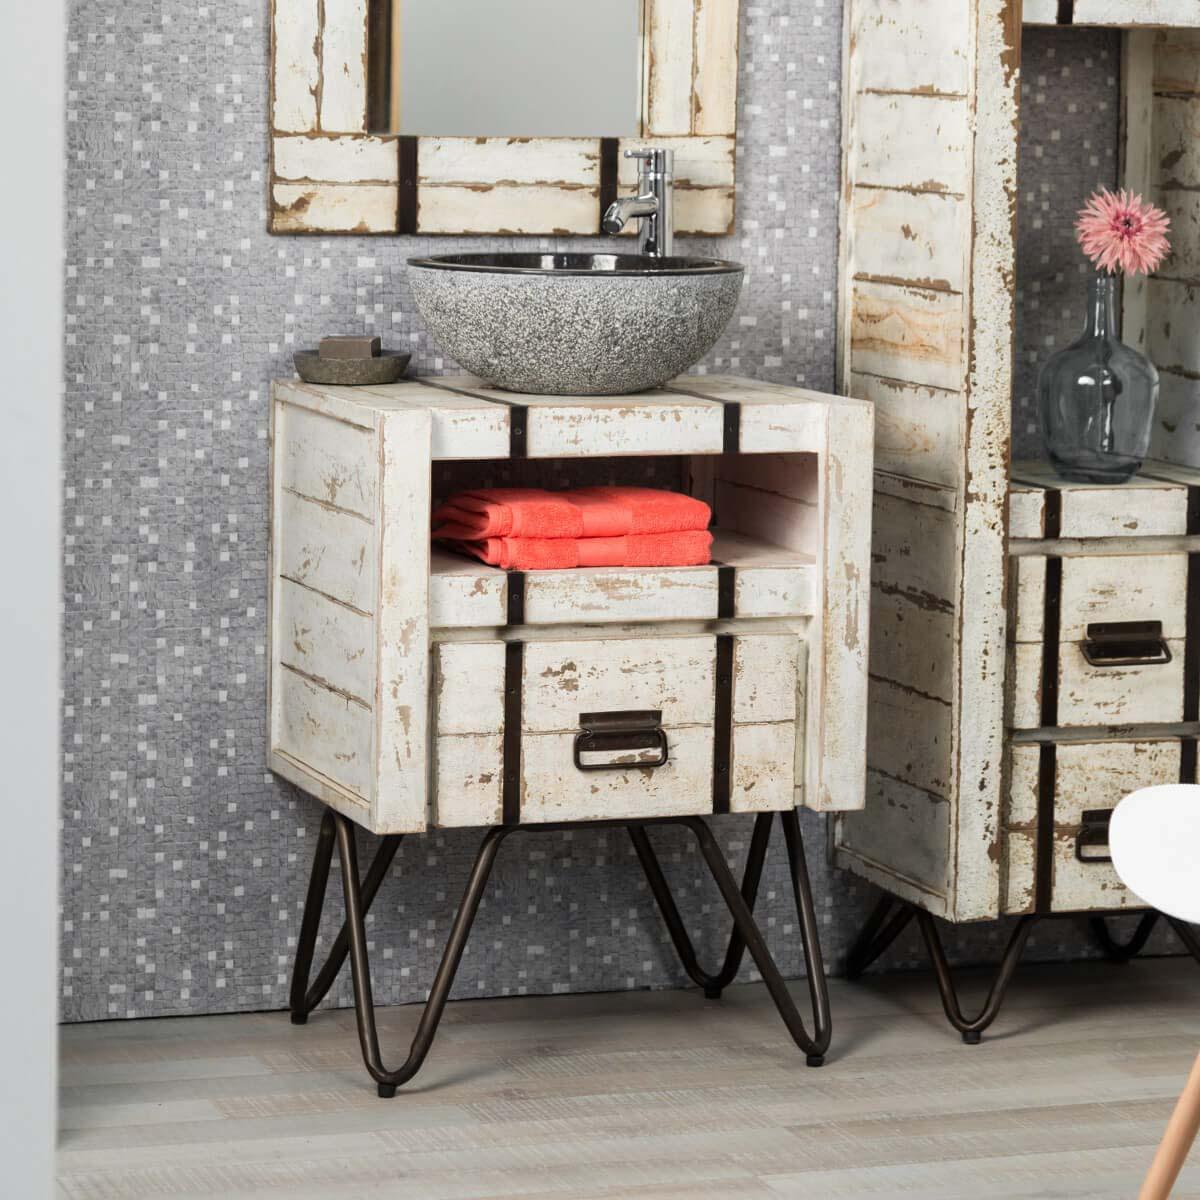 Mueble para lavabo (simple) de madera (mindi) maciza: Loft, blanco ...